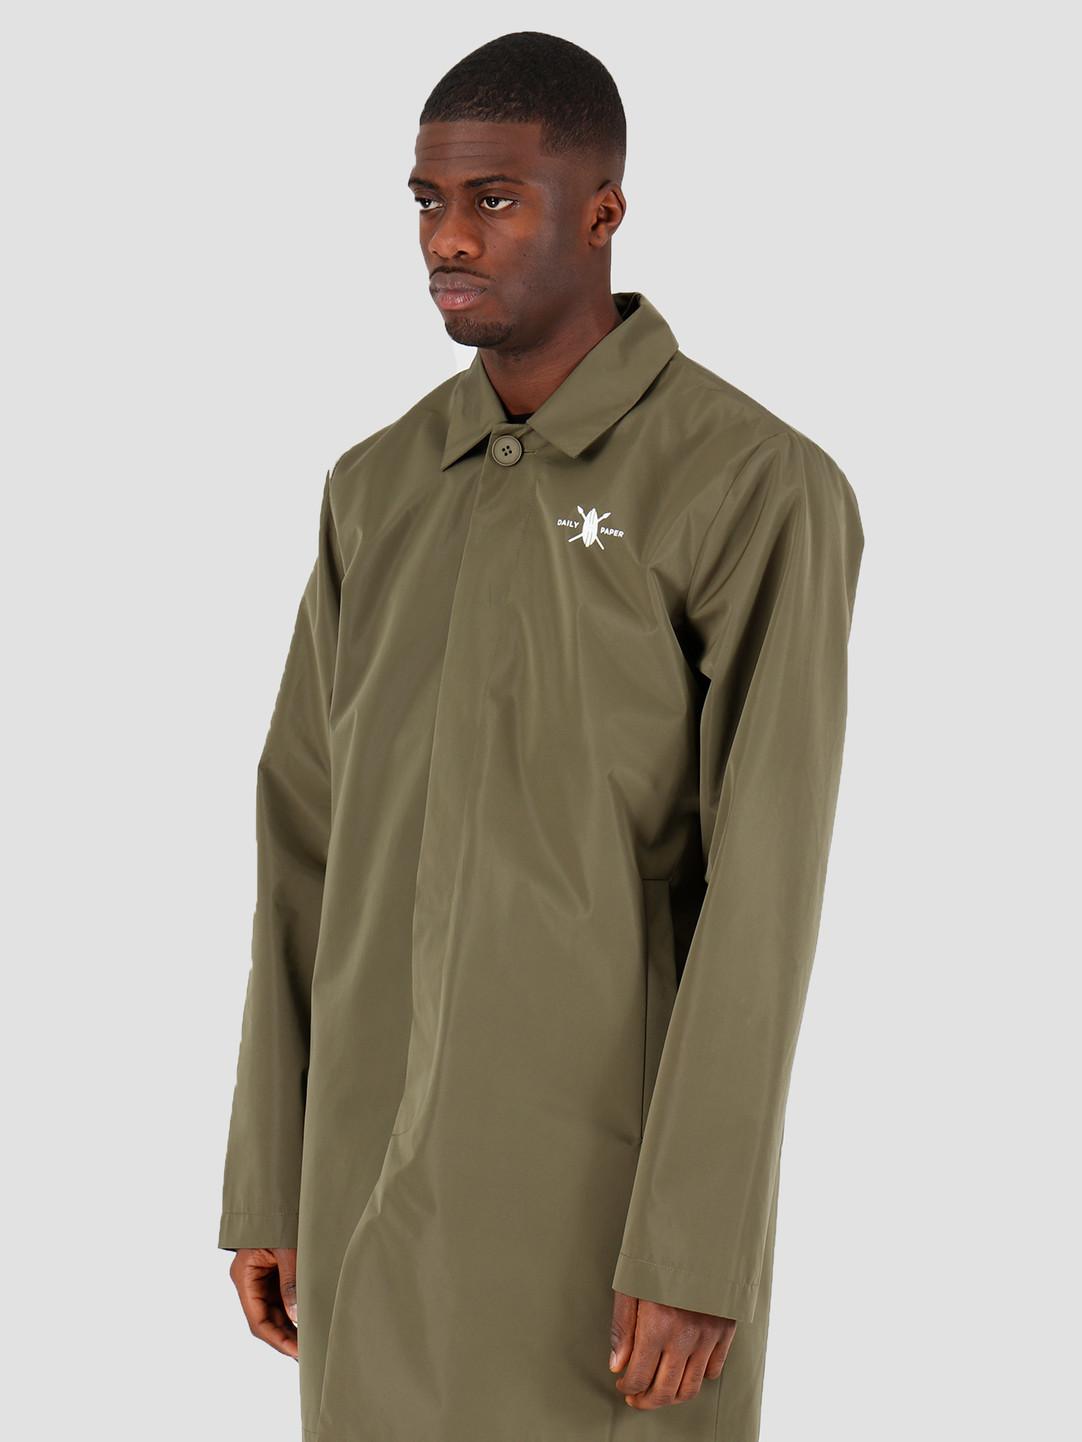 Daily Paper Daily Paper Amack Jacket Grap Leaf Grey 20E1OU03-01